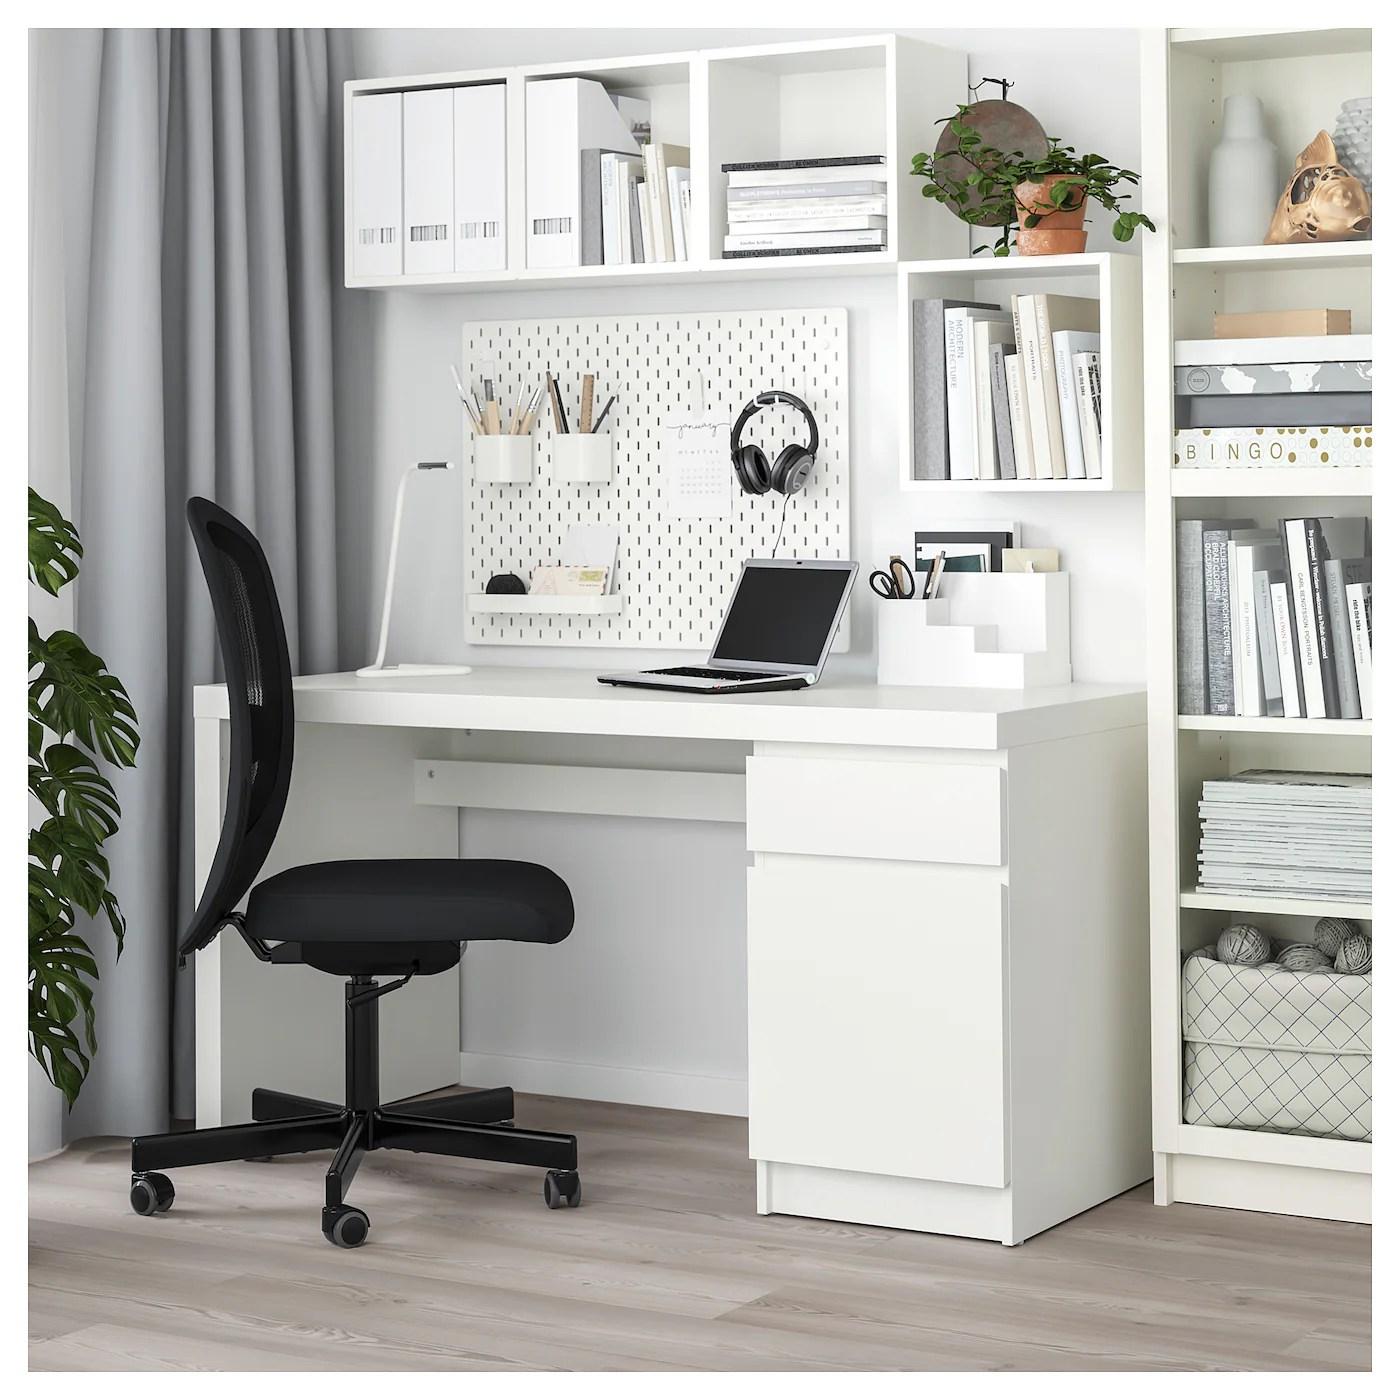 Malm Bureau Blanc 140x65 Cm Ikea